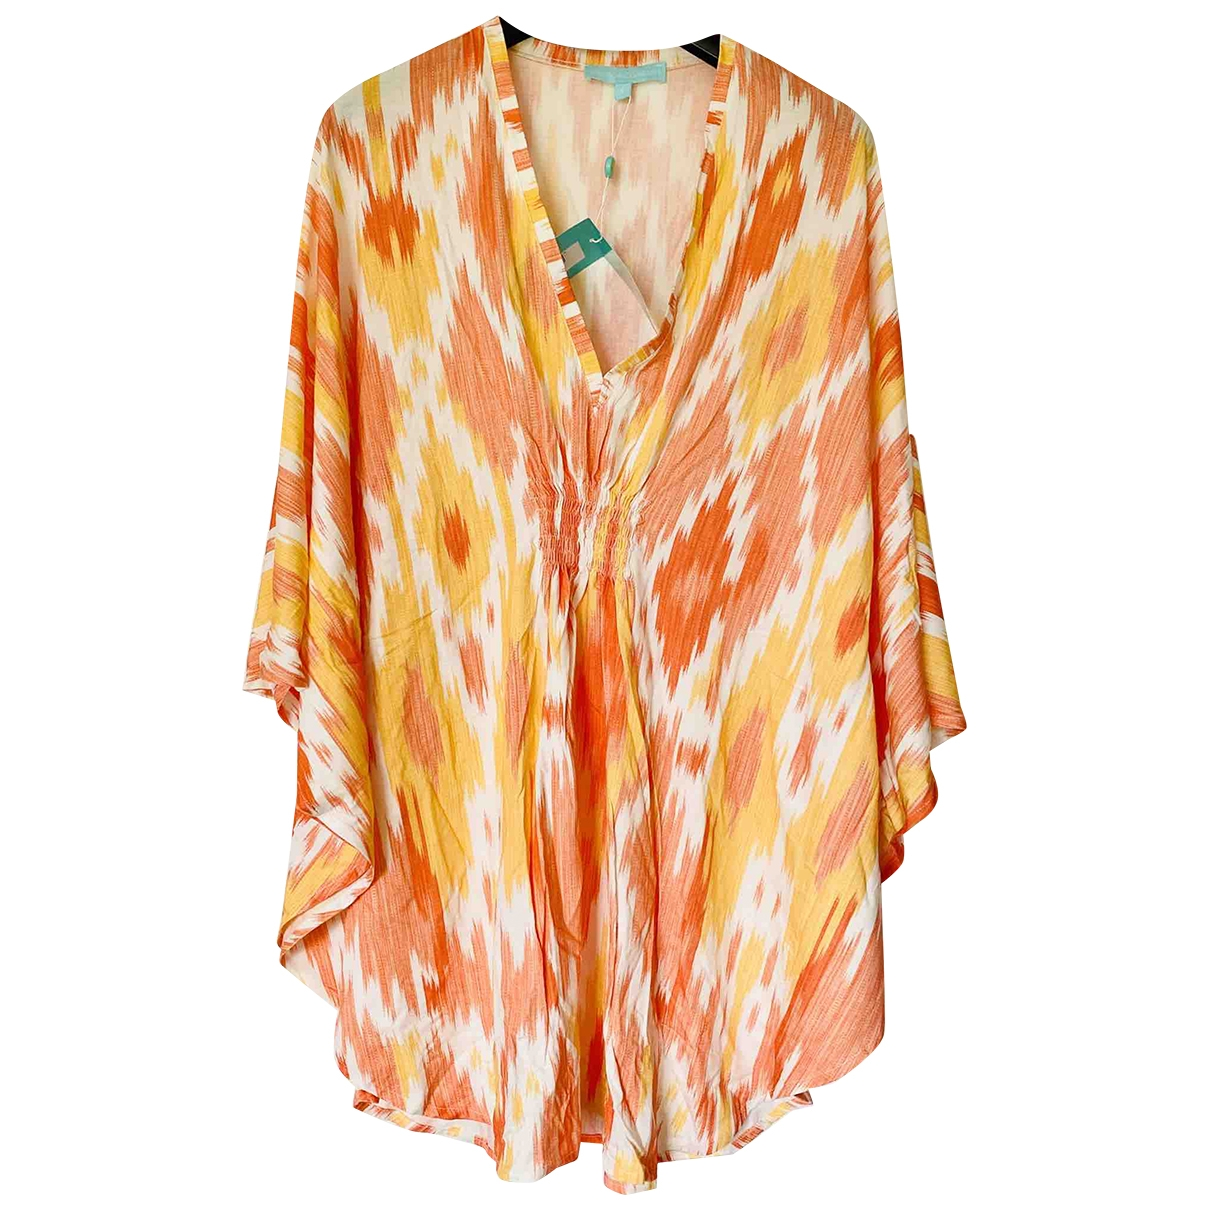 Melissa Odabash \N Orange dress for Women L International